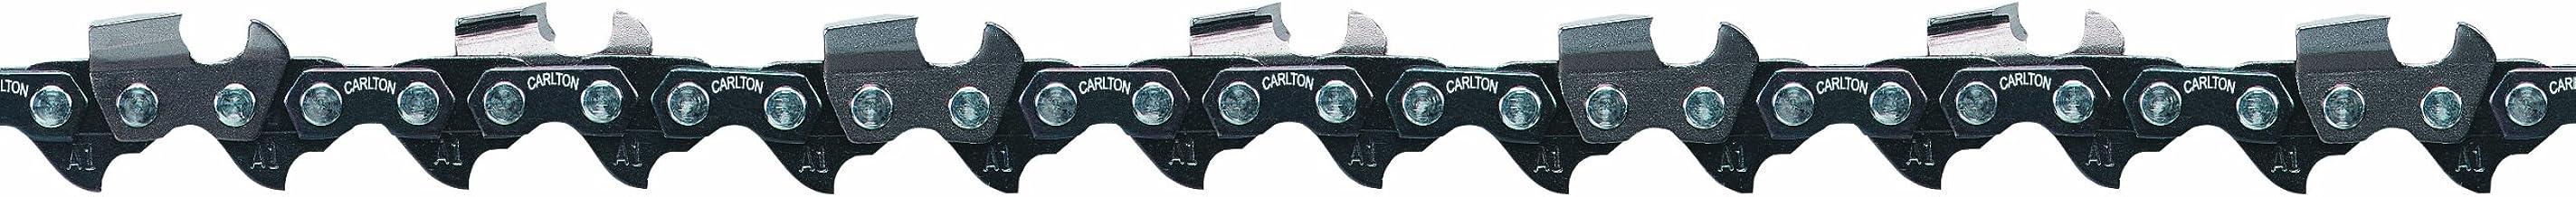 Carlton A1LM-060G 50-Gauge Chisel Chain, Loop, 3/8-Inch